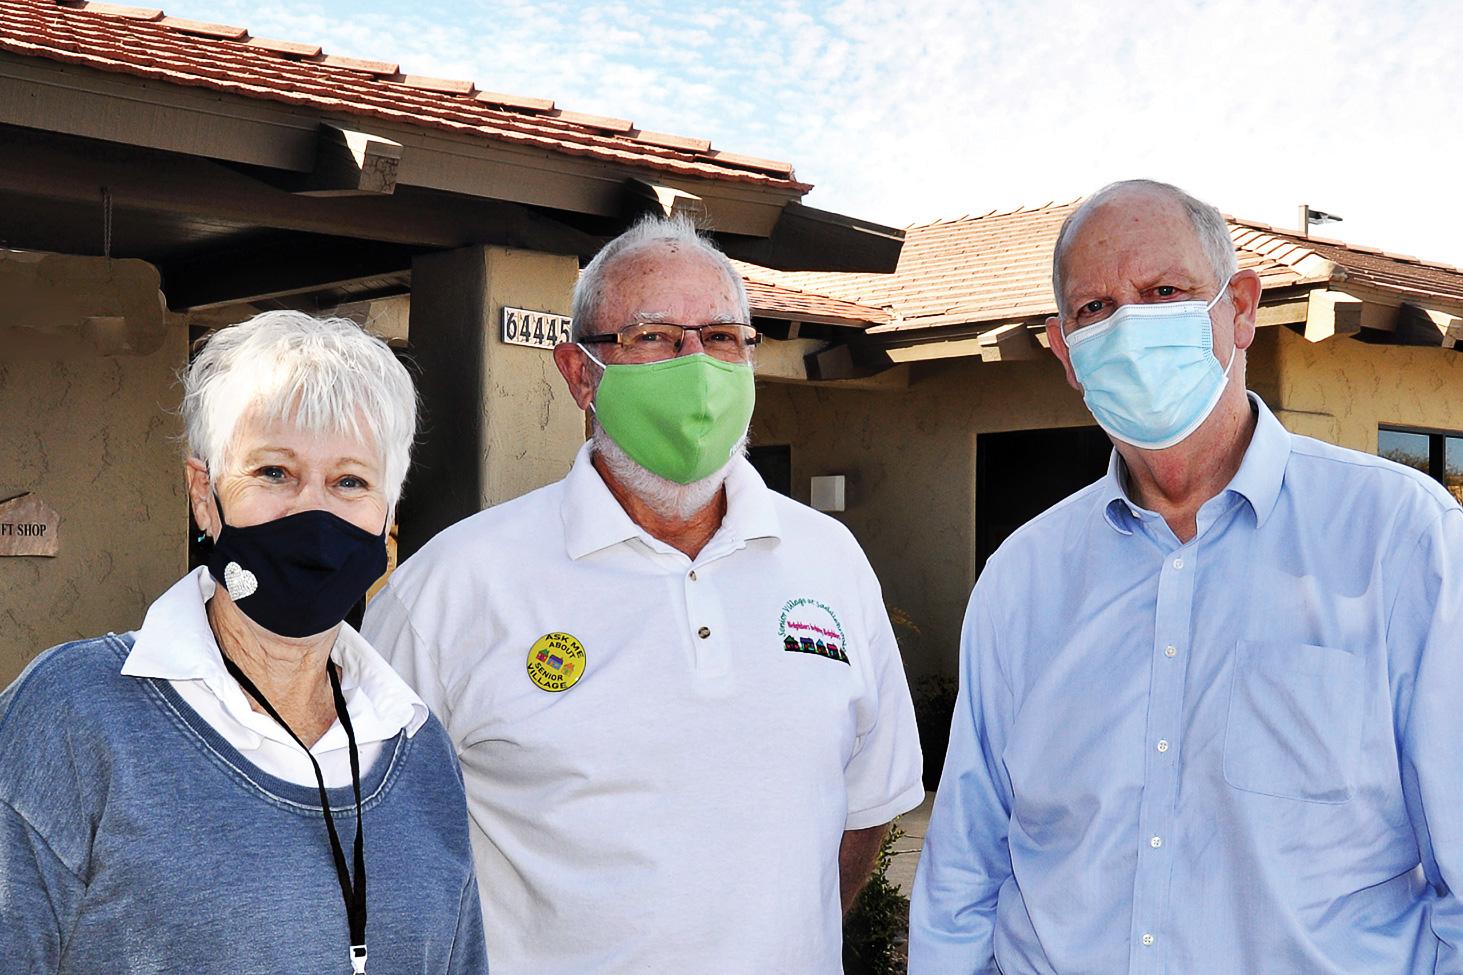 AZ Rep. Tom O'Halleran met with Senior Village Executive Director Linda Hampton and Board Chairman David Loendorf to learn about the logistics of the SaddleBrooke vaccination clinics.